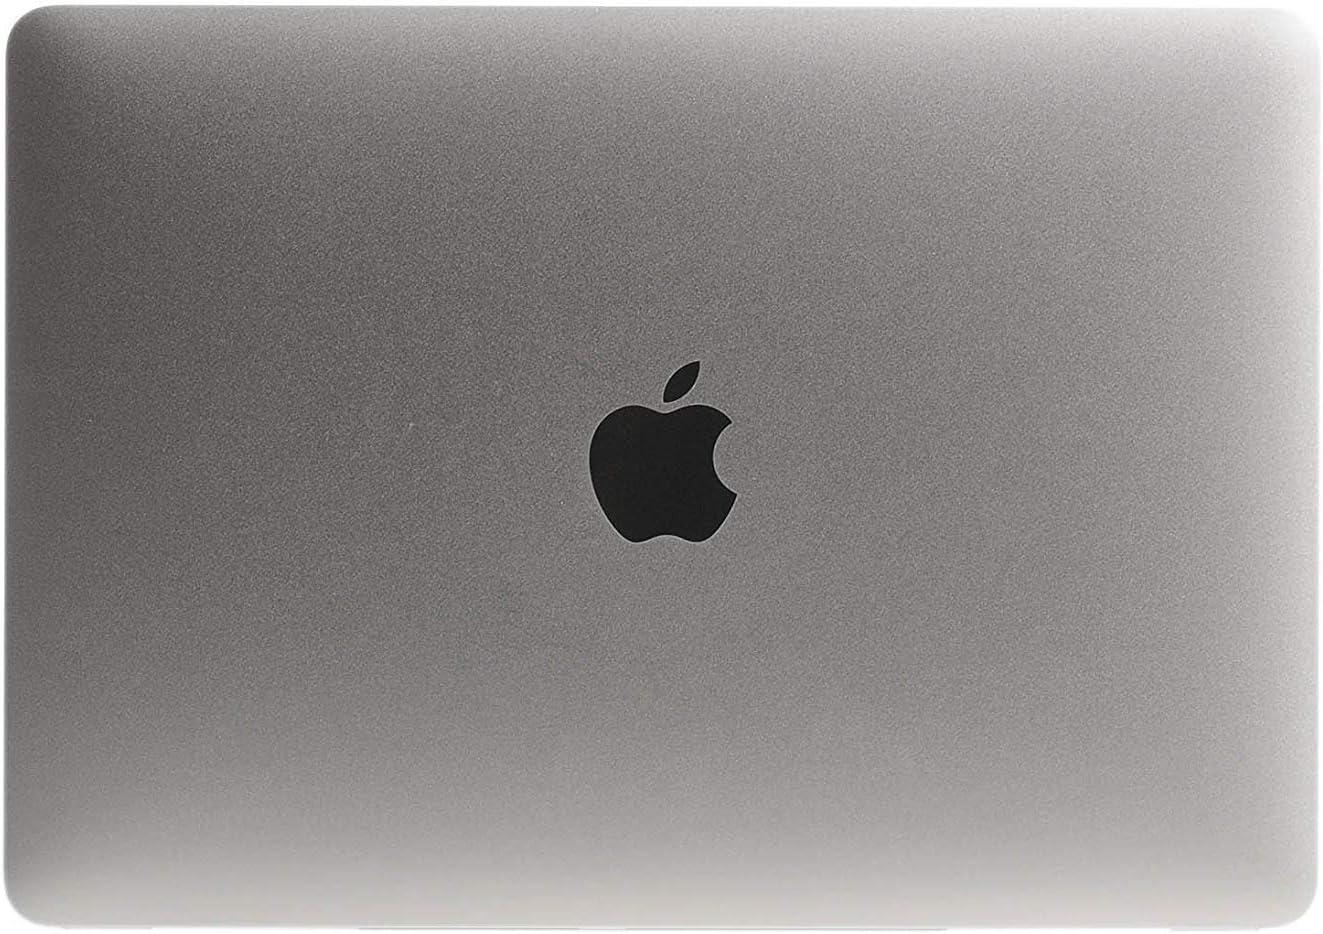 Trackpad 2015 SILVER Genuine Apple Mackbook 12 Retina A1534 Touchpad